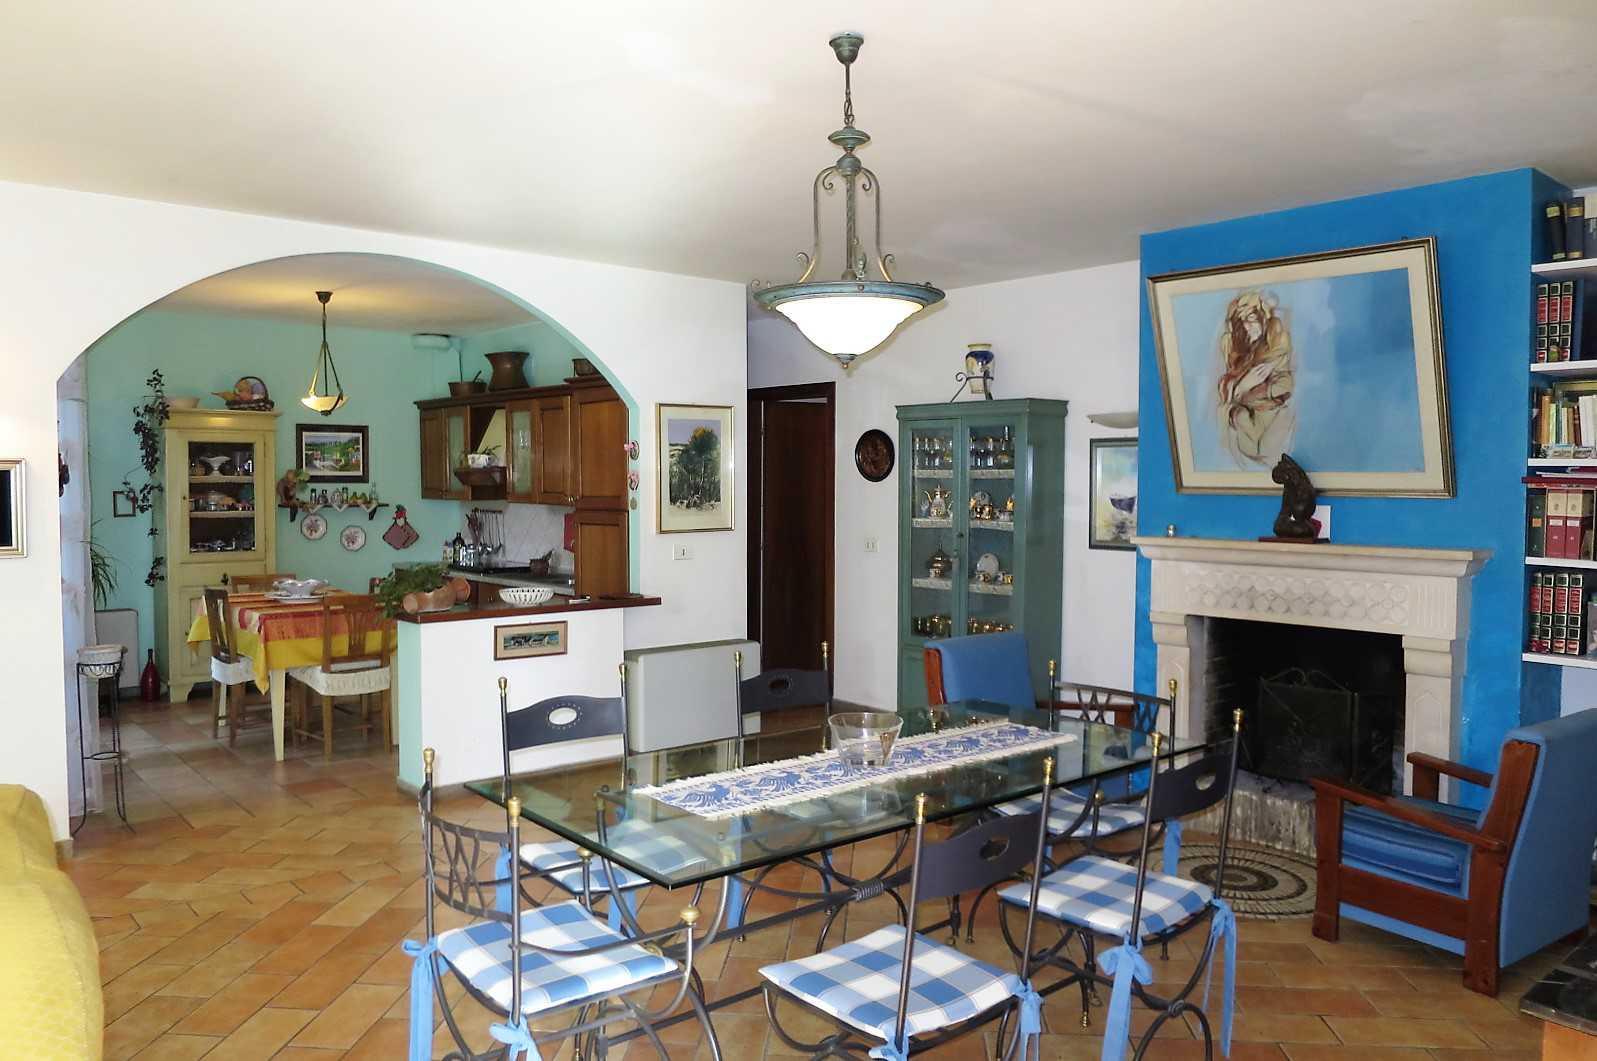 Villa Villa in vendita Atri (TE), Villa Paola - Atri - EUR 471.071 100